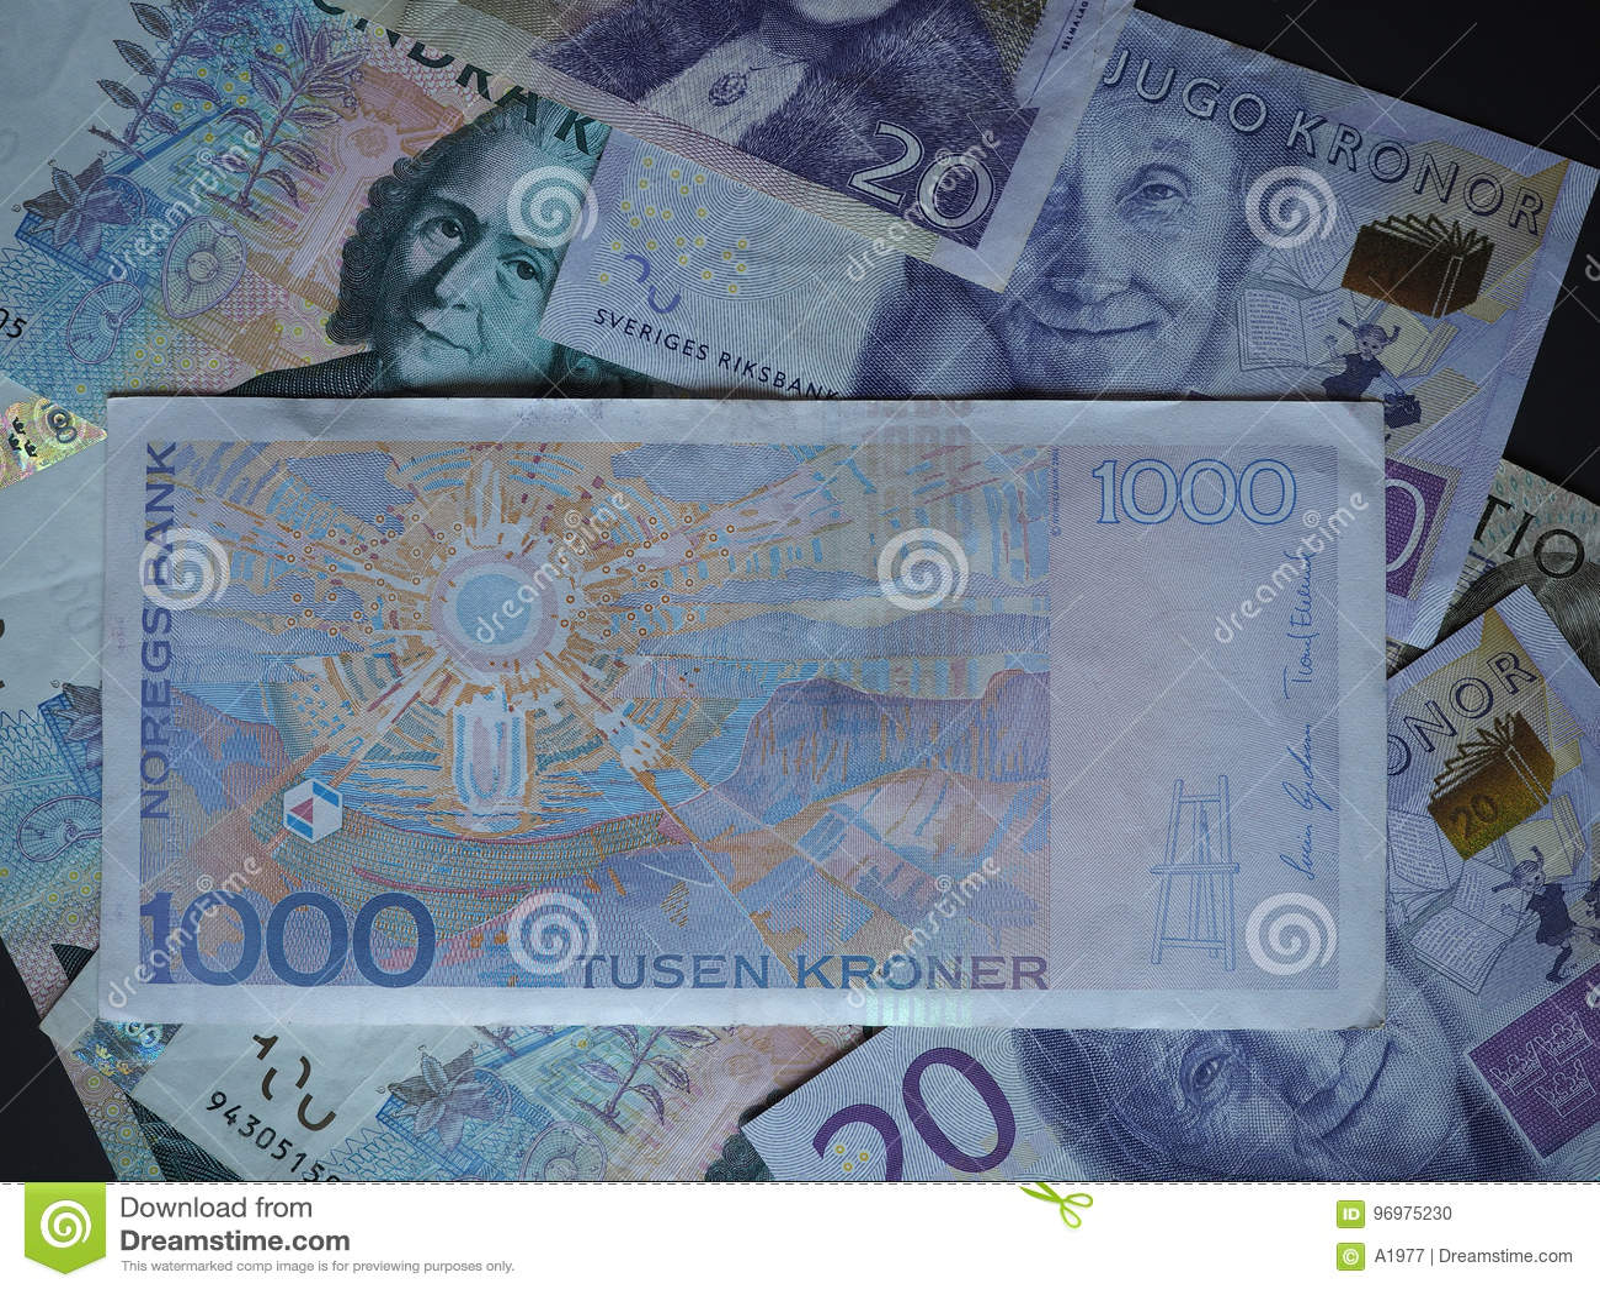 1000 Norwegian Krone NOK Note Stock Photo - Image of swedish. currency: 96975230